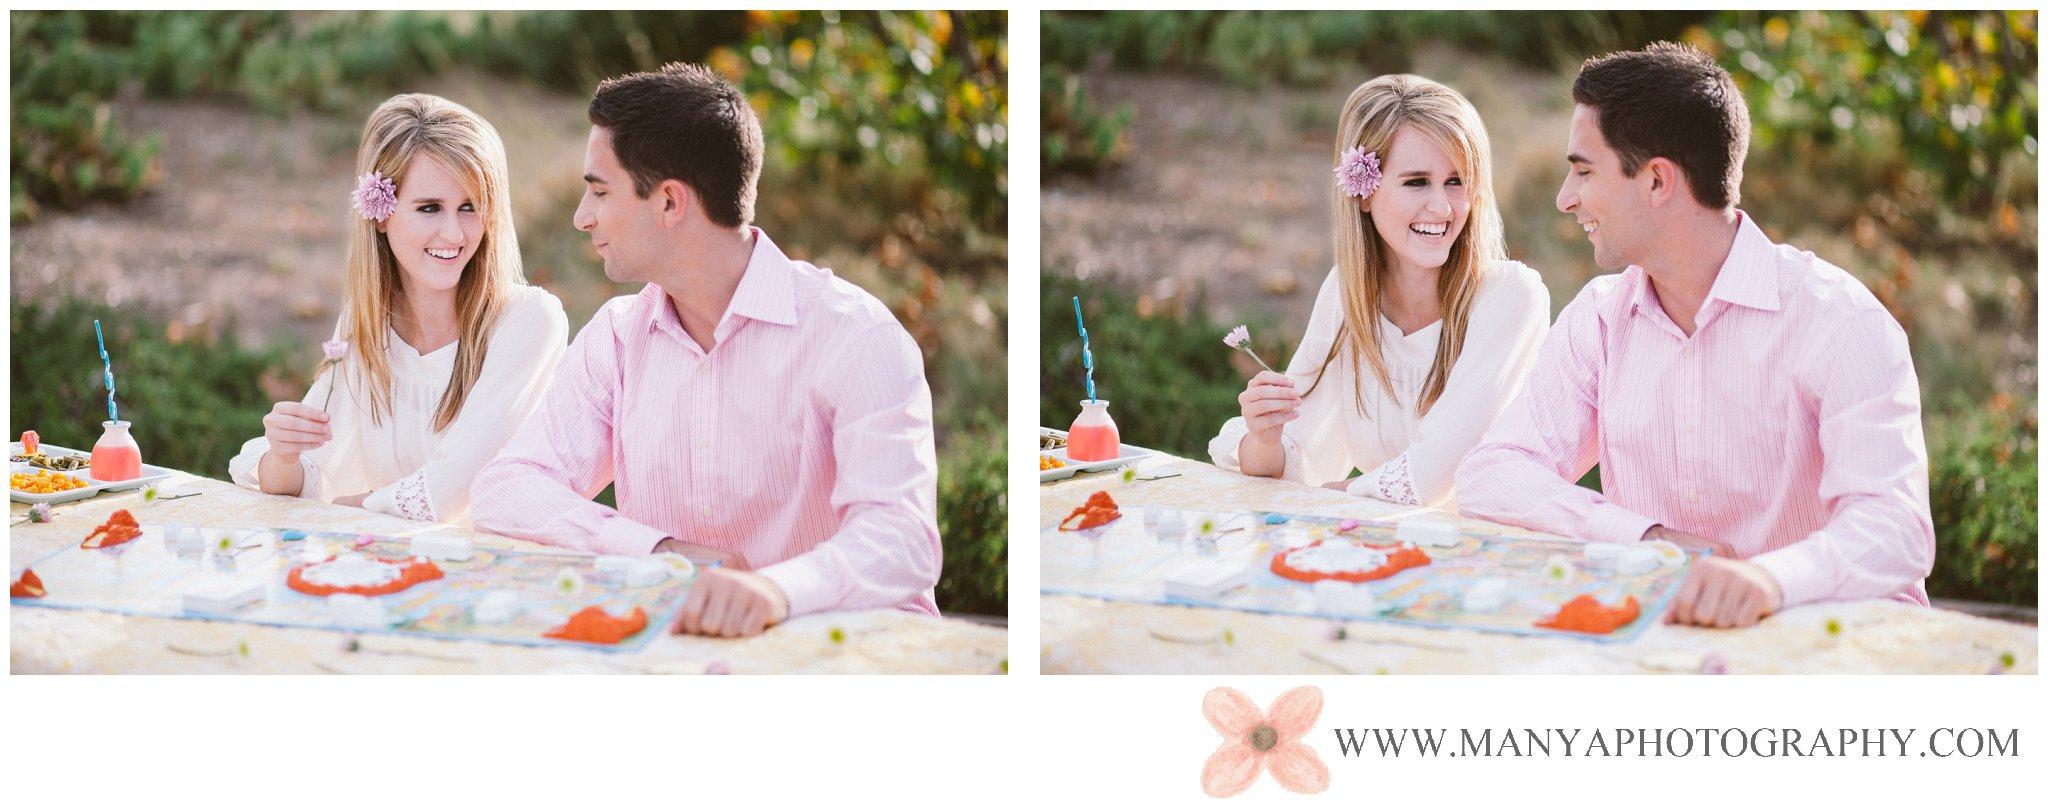 2013-10-17_0021 - Orange County Wedding Photographer